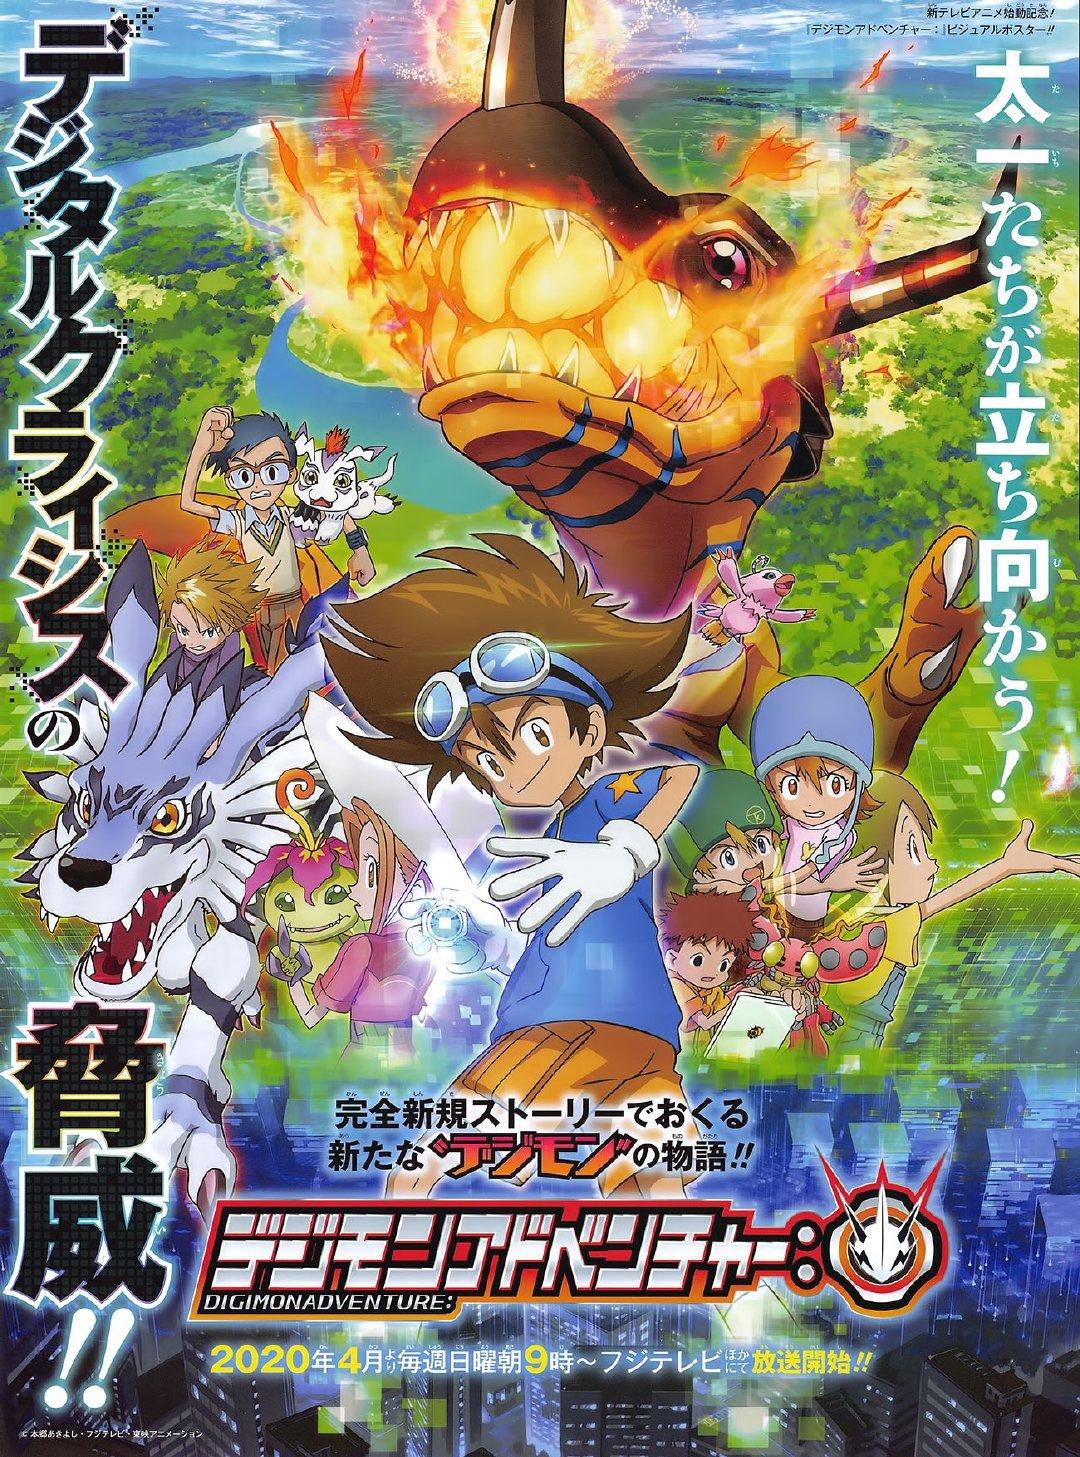 Digimon Adventure 2020 Affiche